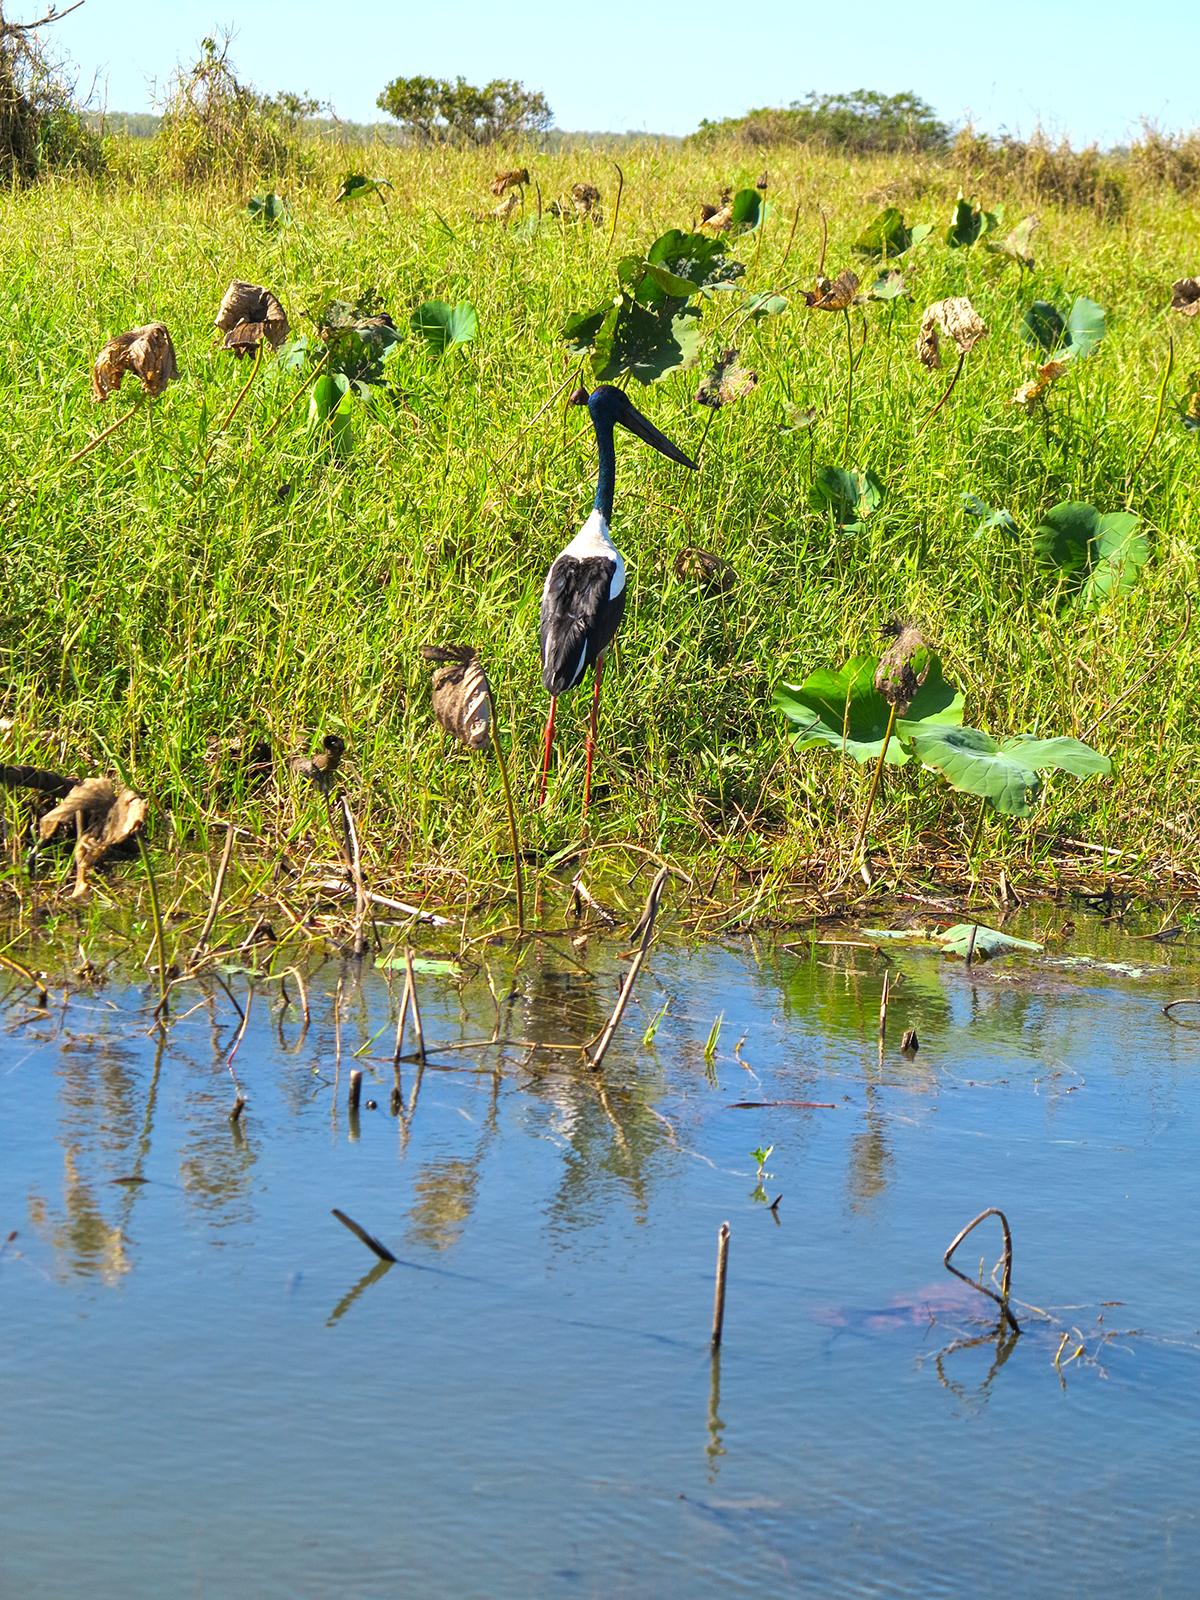 A jabiru stalks the bank of Corroboree Billabong.